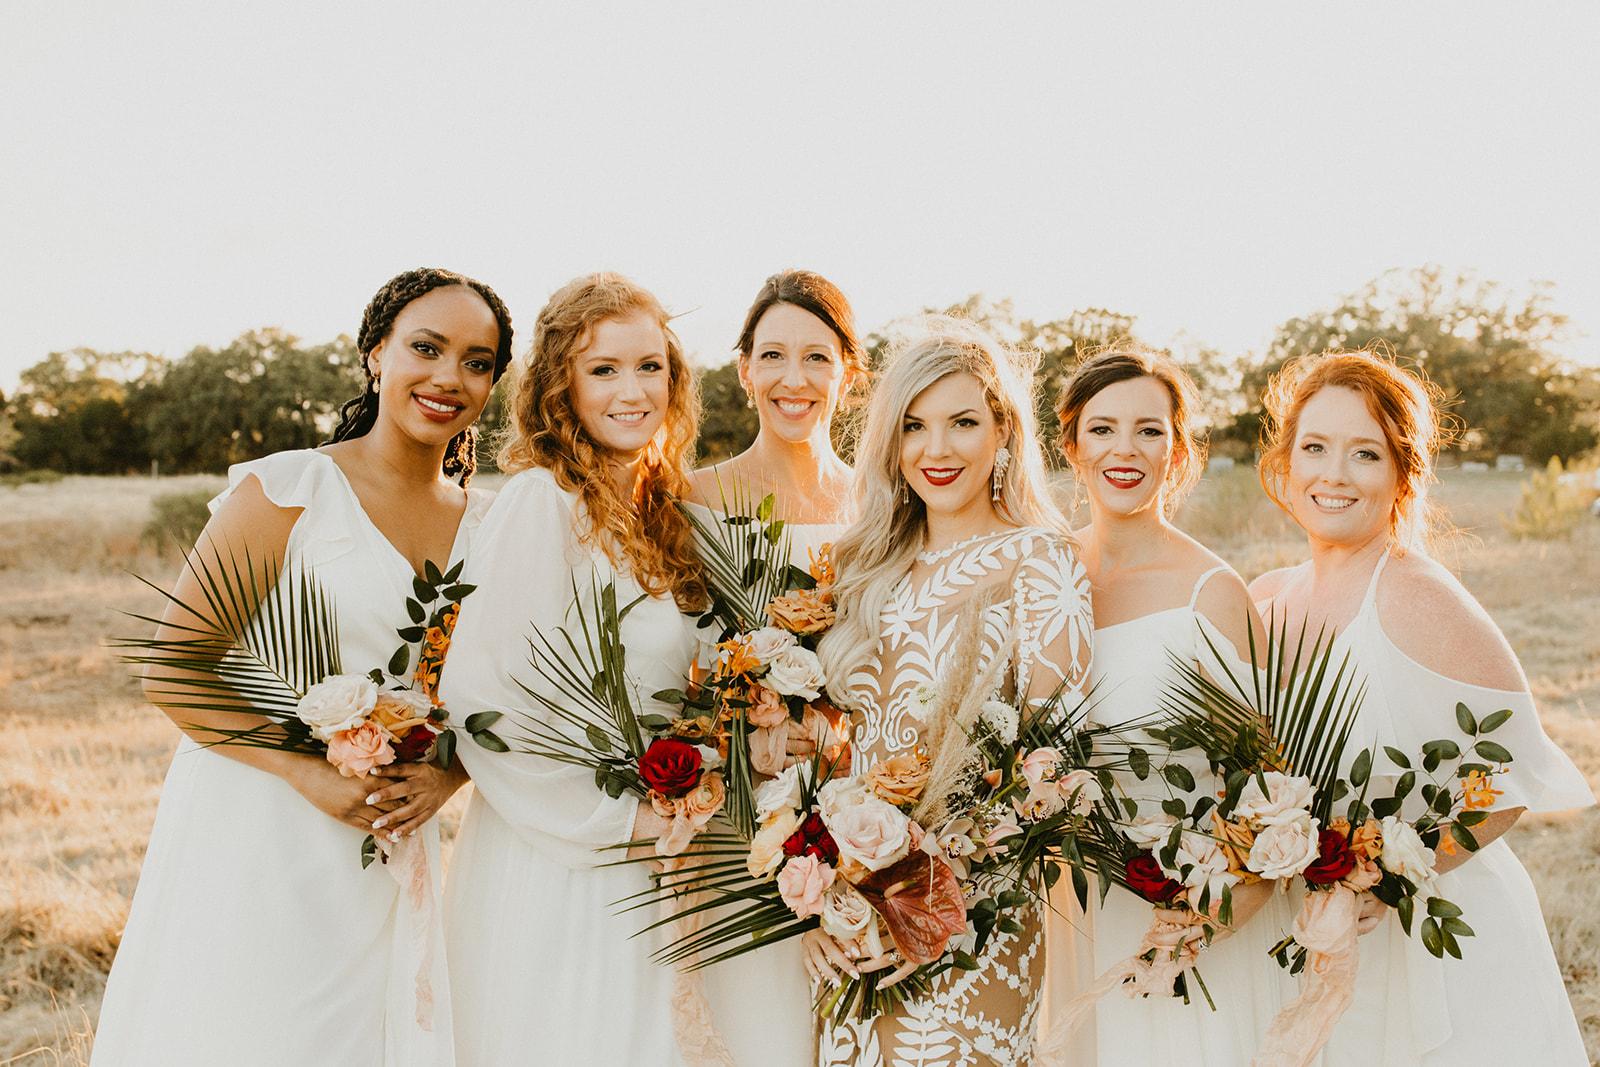 Tropical Colorful Frond Bridesmaid + Bride Bouquets + White Creamy Bridesmaid Dresses + Rue De Seine Wedding Dress + Boho Wedding + Wedding Designer Planner Epoch Co+